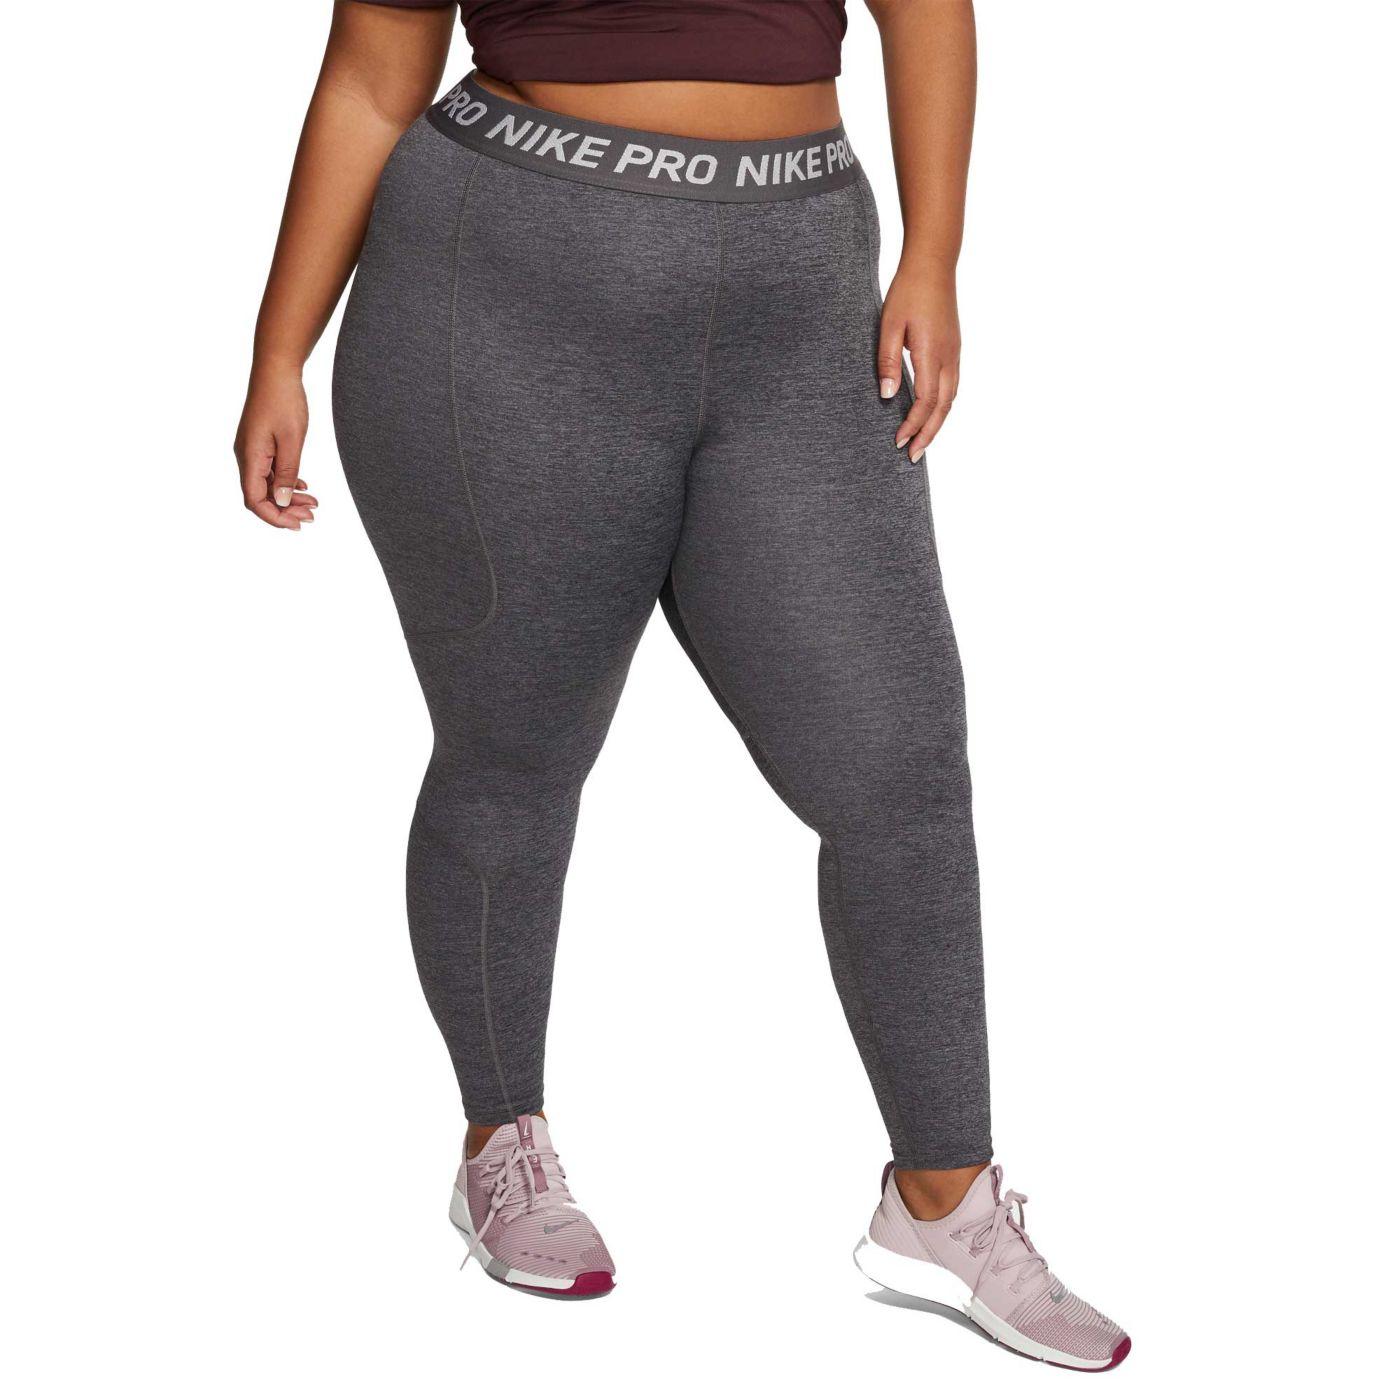 Nike Pro Women's Plus Size Warm Tights